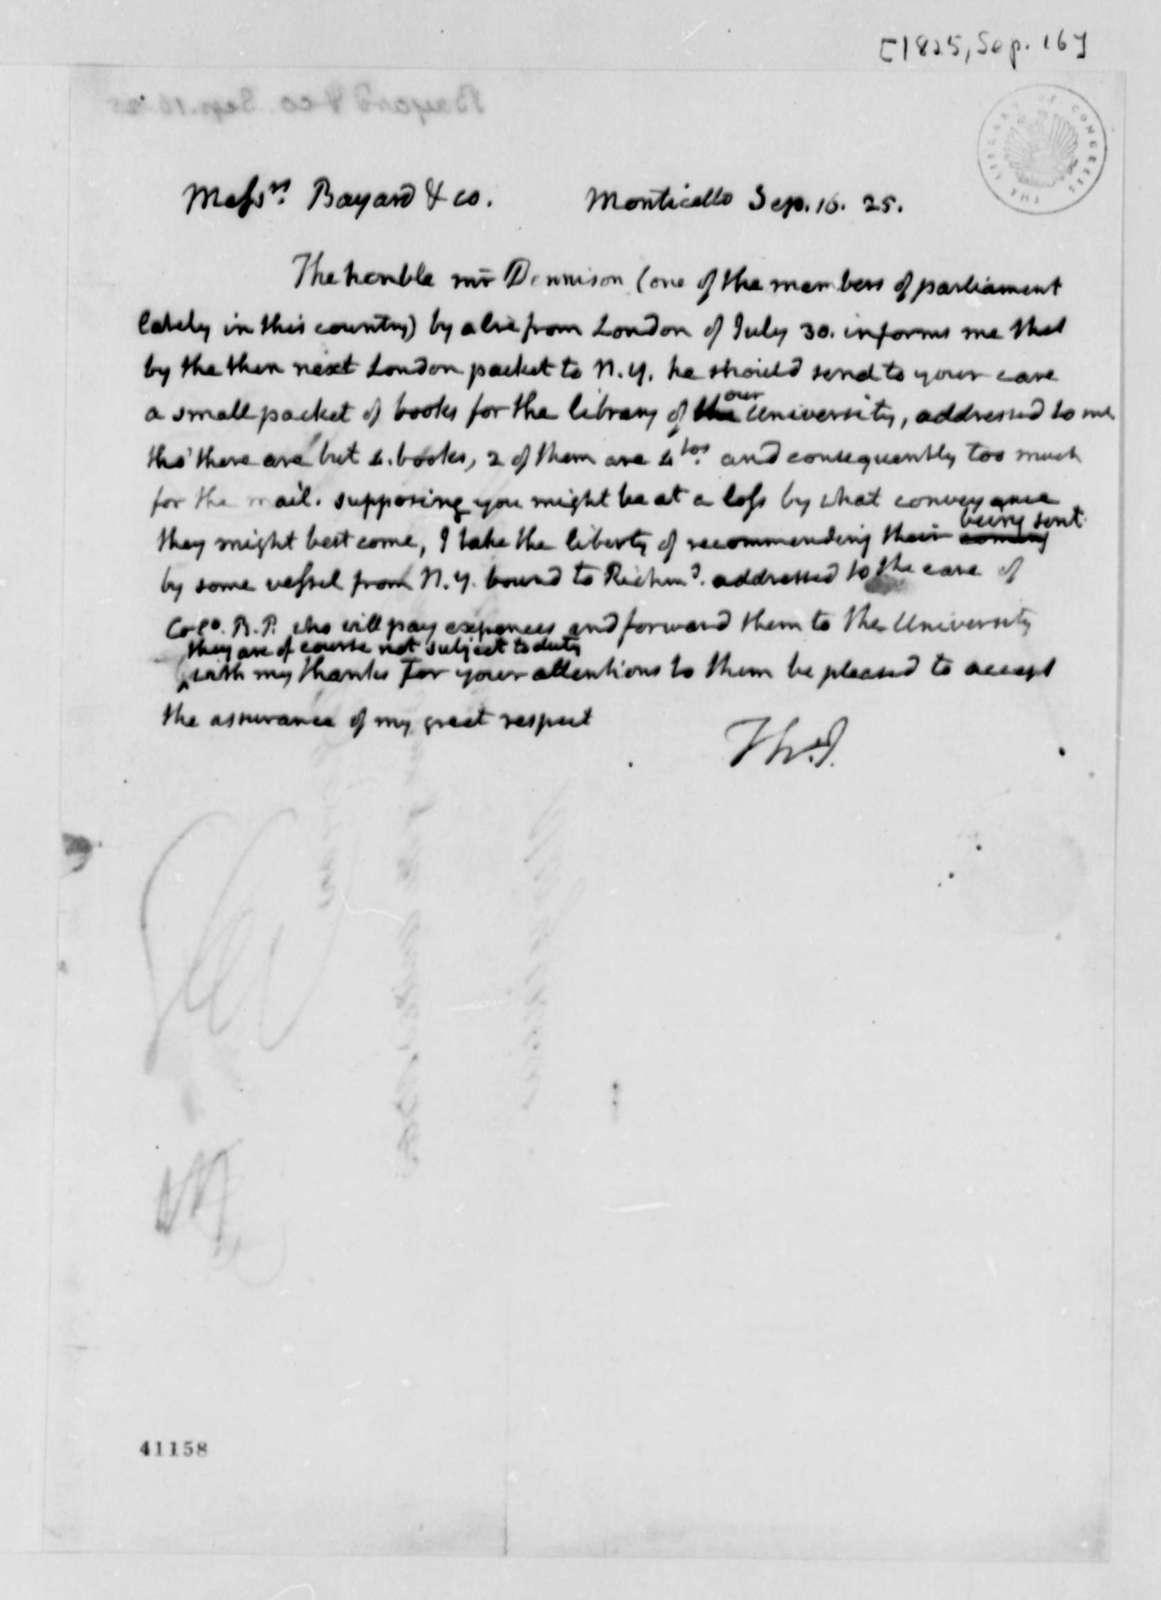 Thomas Jefferson to Bayard & Company, September 16, 1825